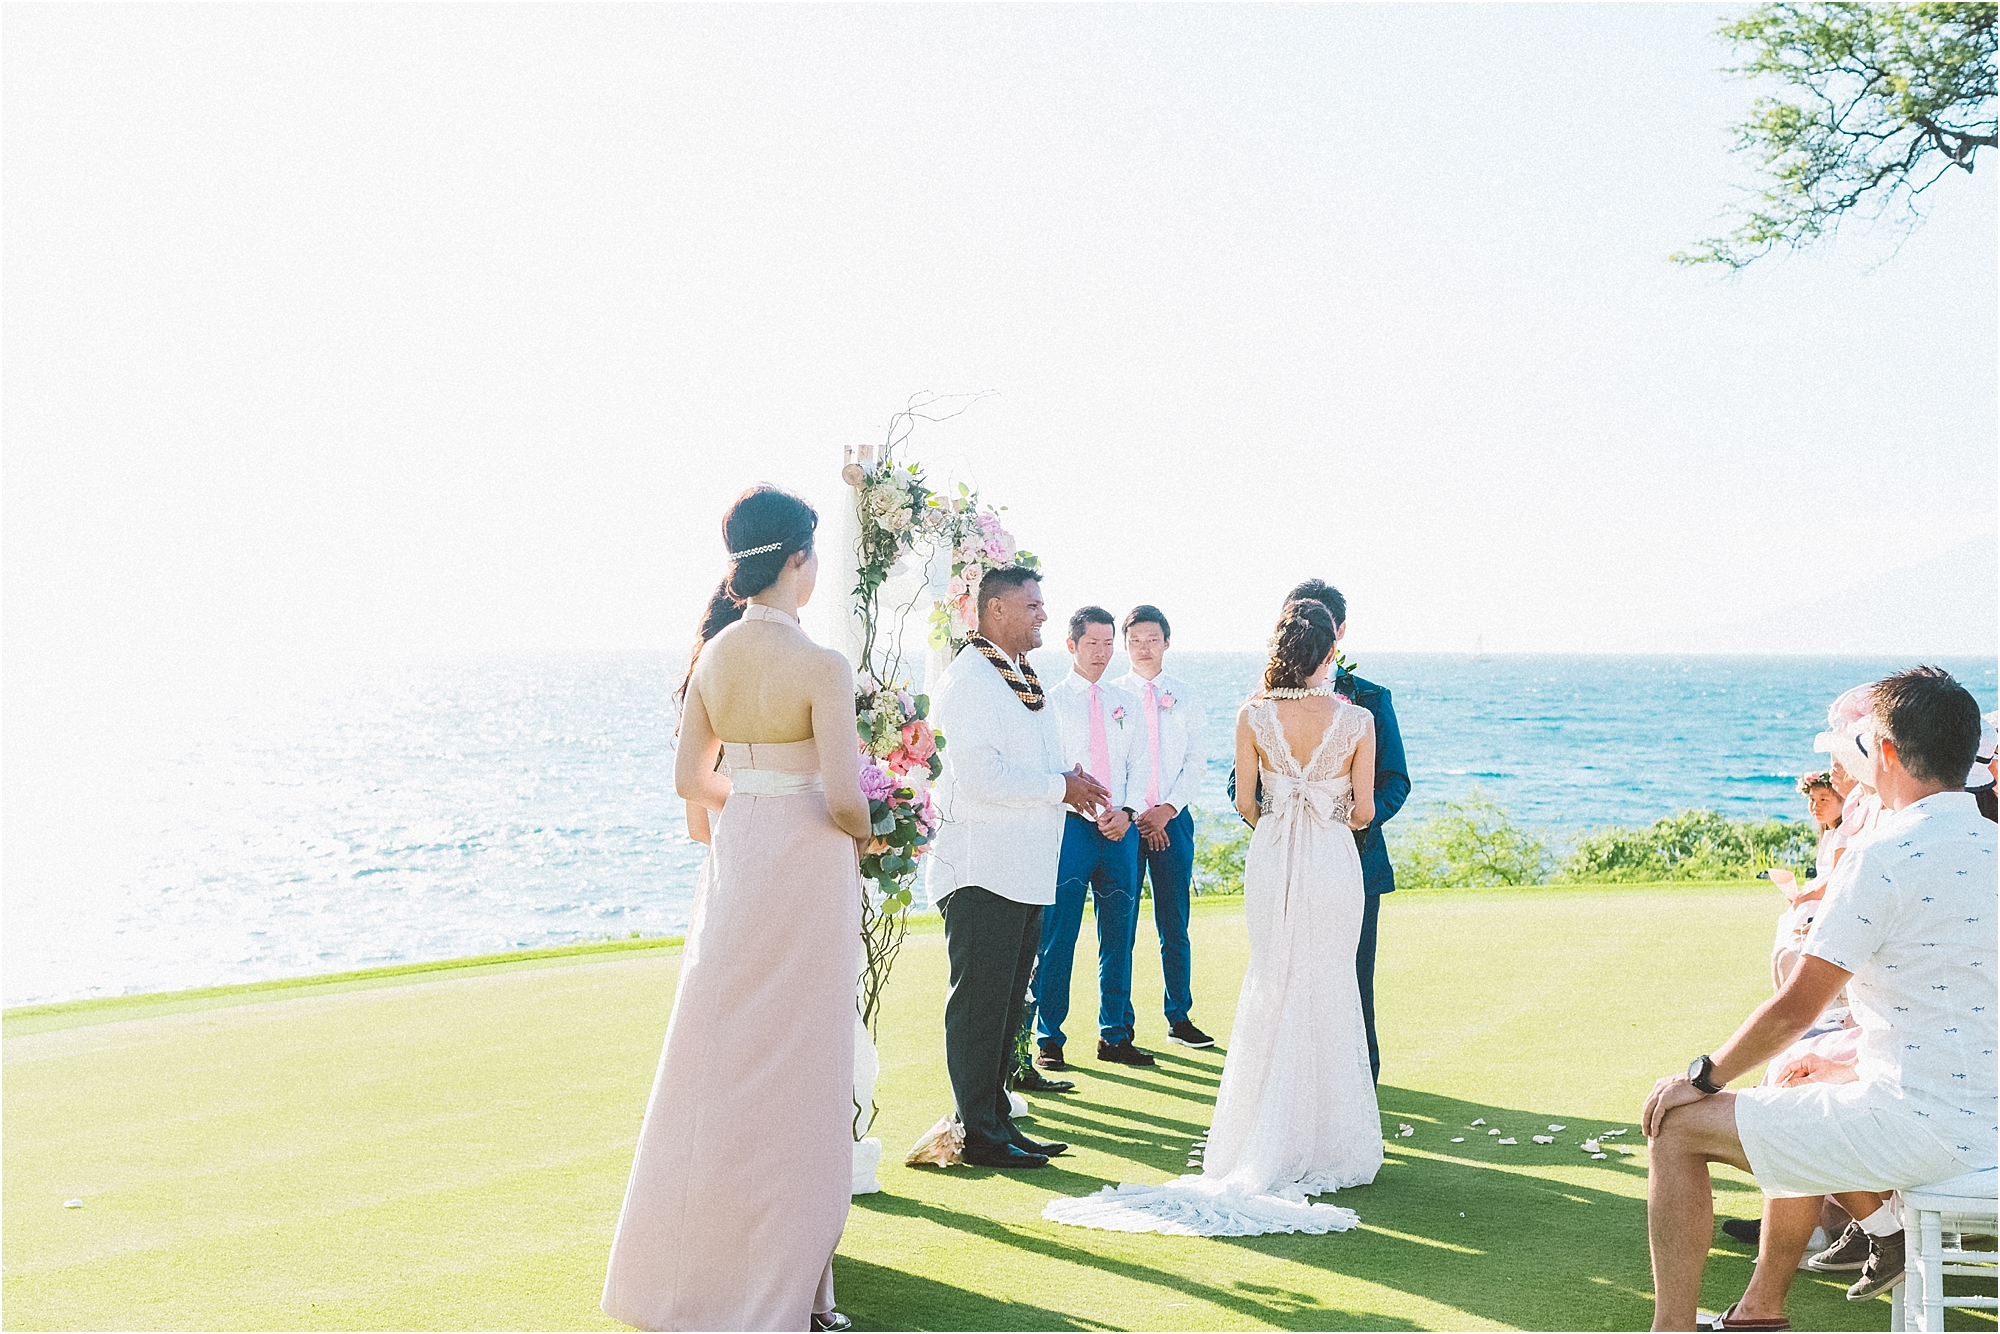 angie-diaz-photography-maui-hawaii-destination-wedding-makena-golf-beach-club_0024.jpg